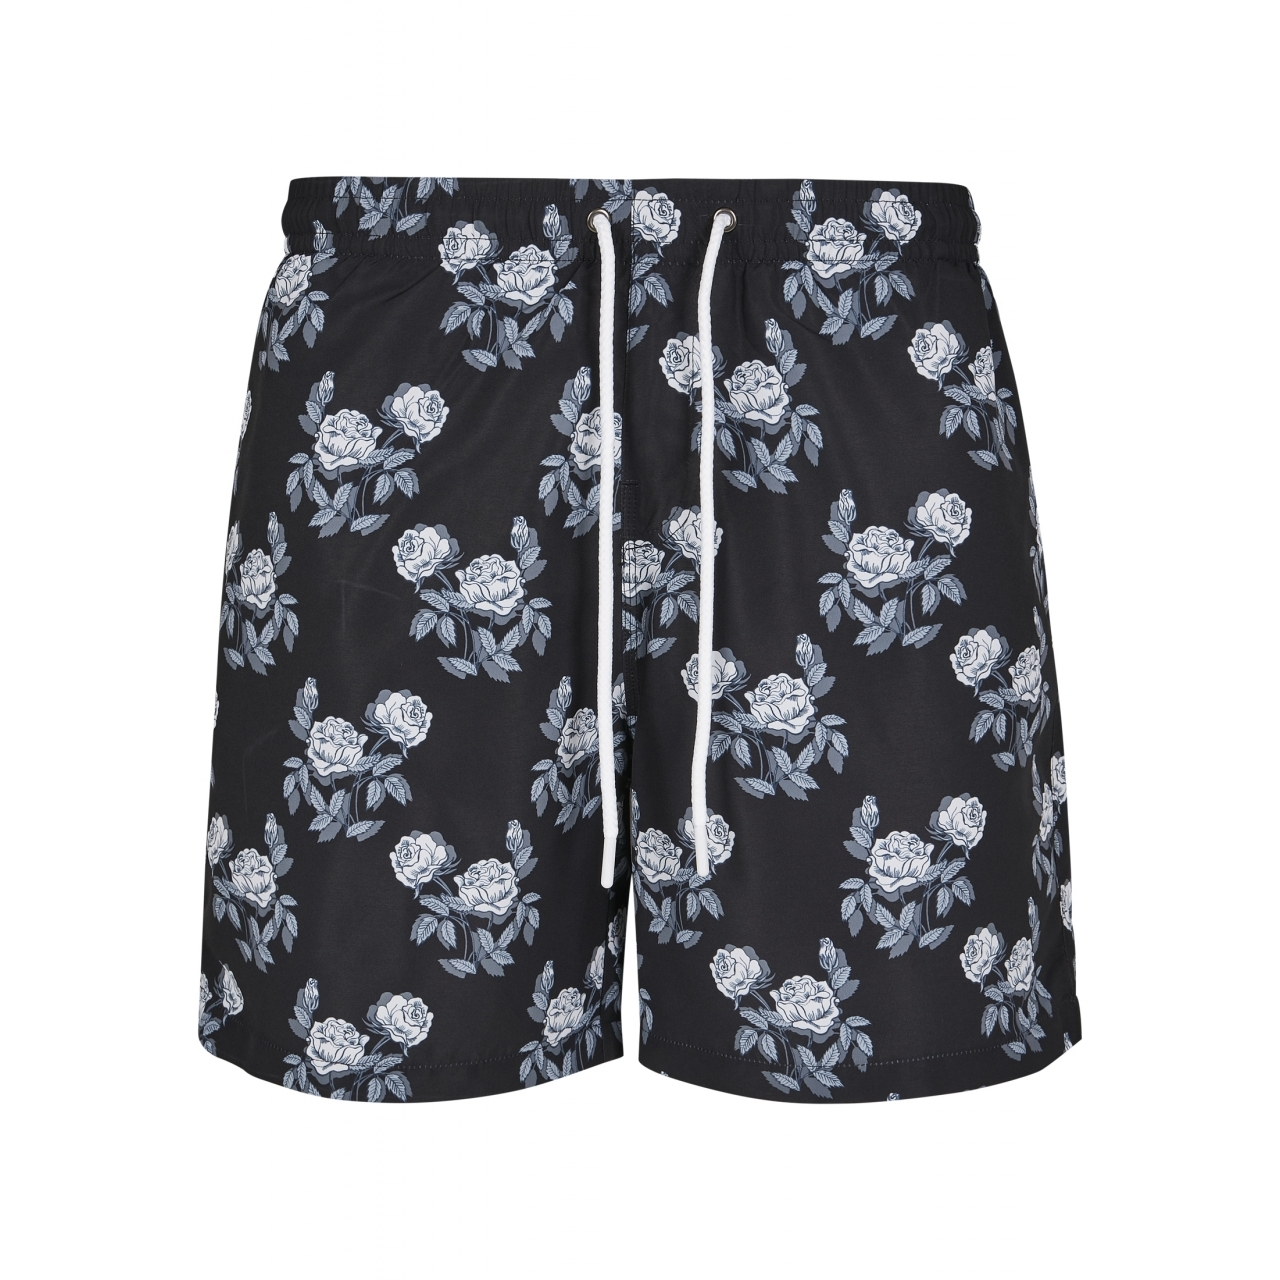 Plavky Urban Classics Pattern Rose - černé, XL